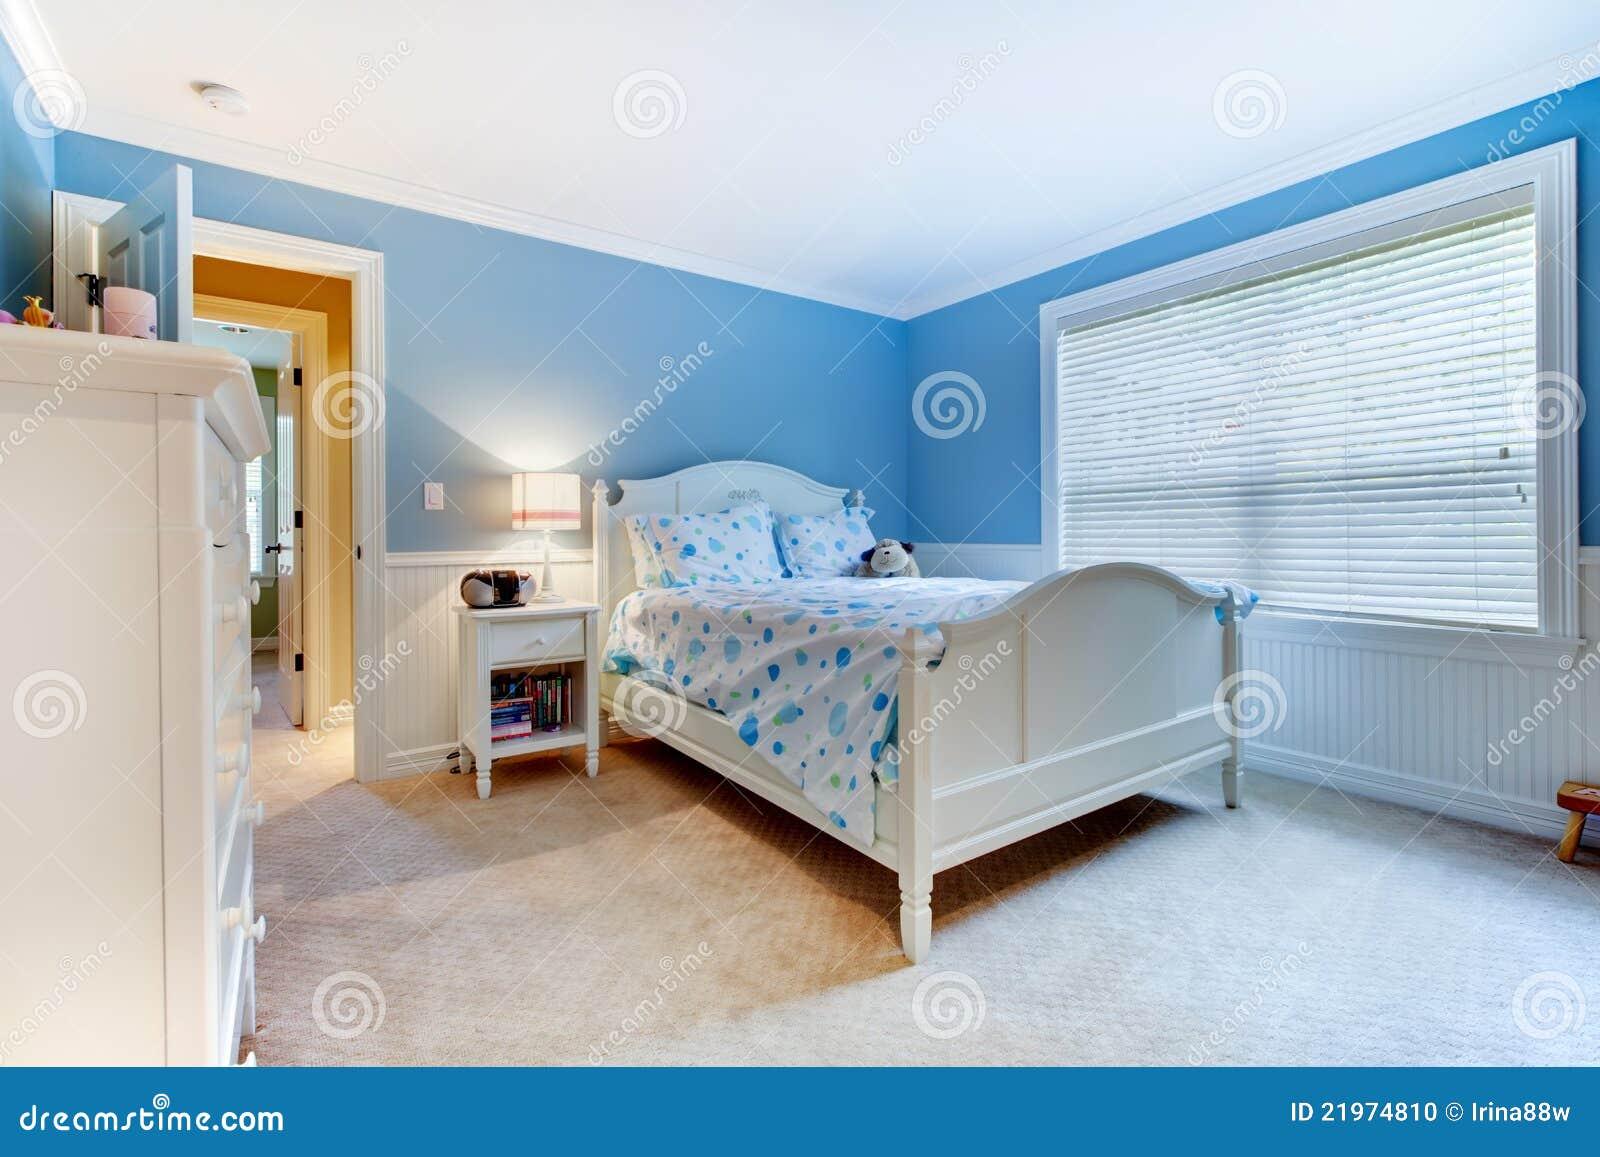 Blue Girls Kids Bedroom Interior Stock Photo Image 21974810